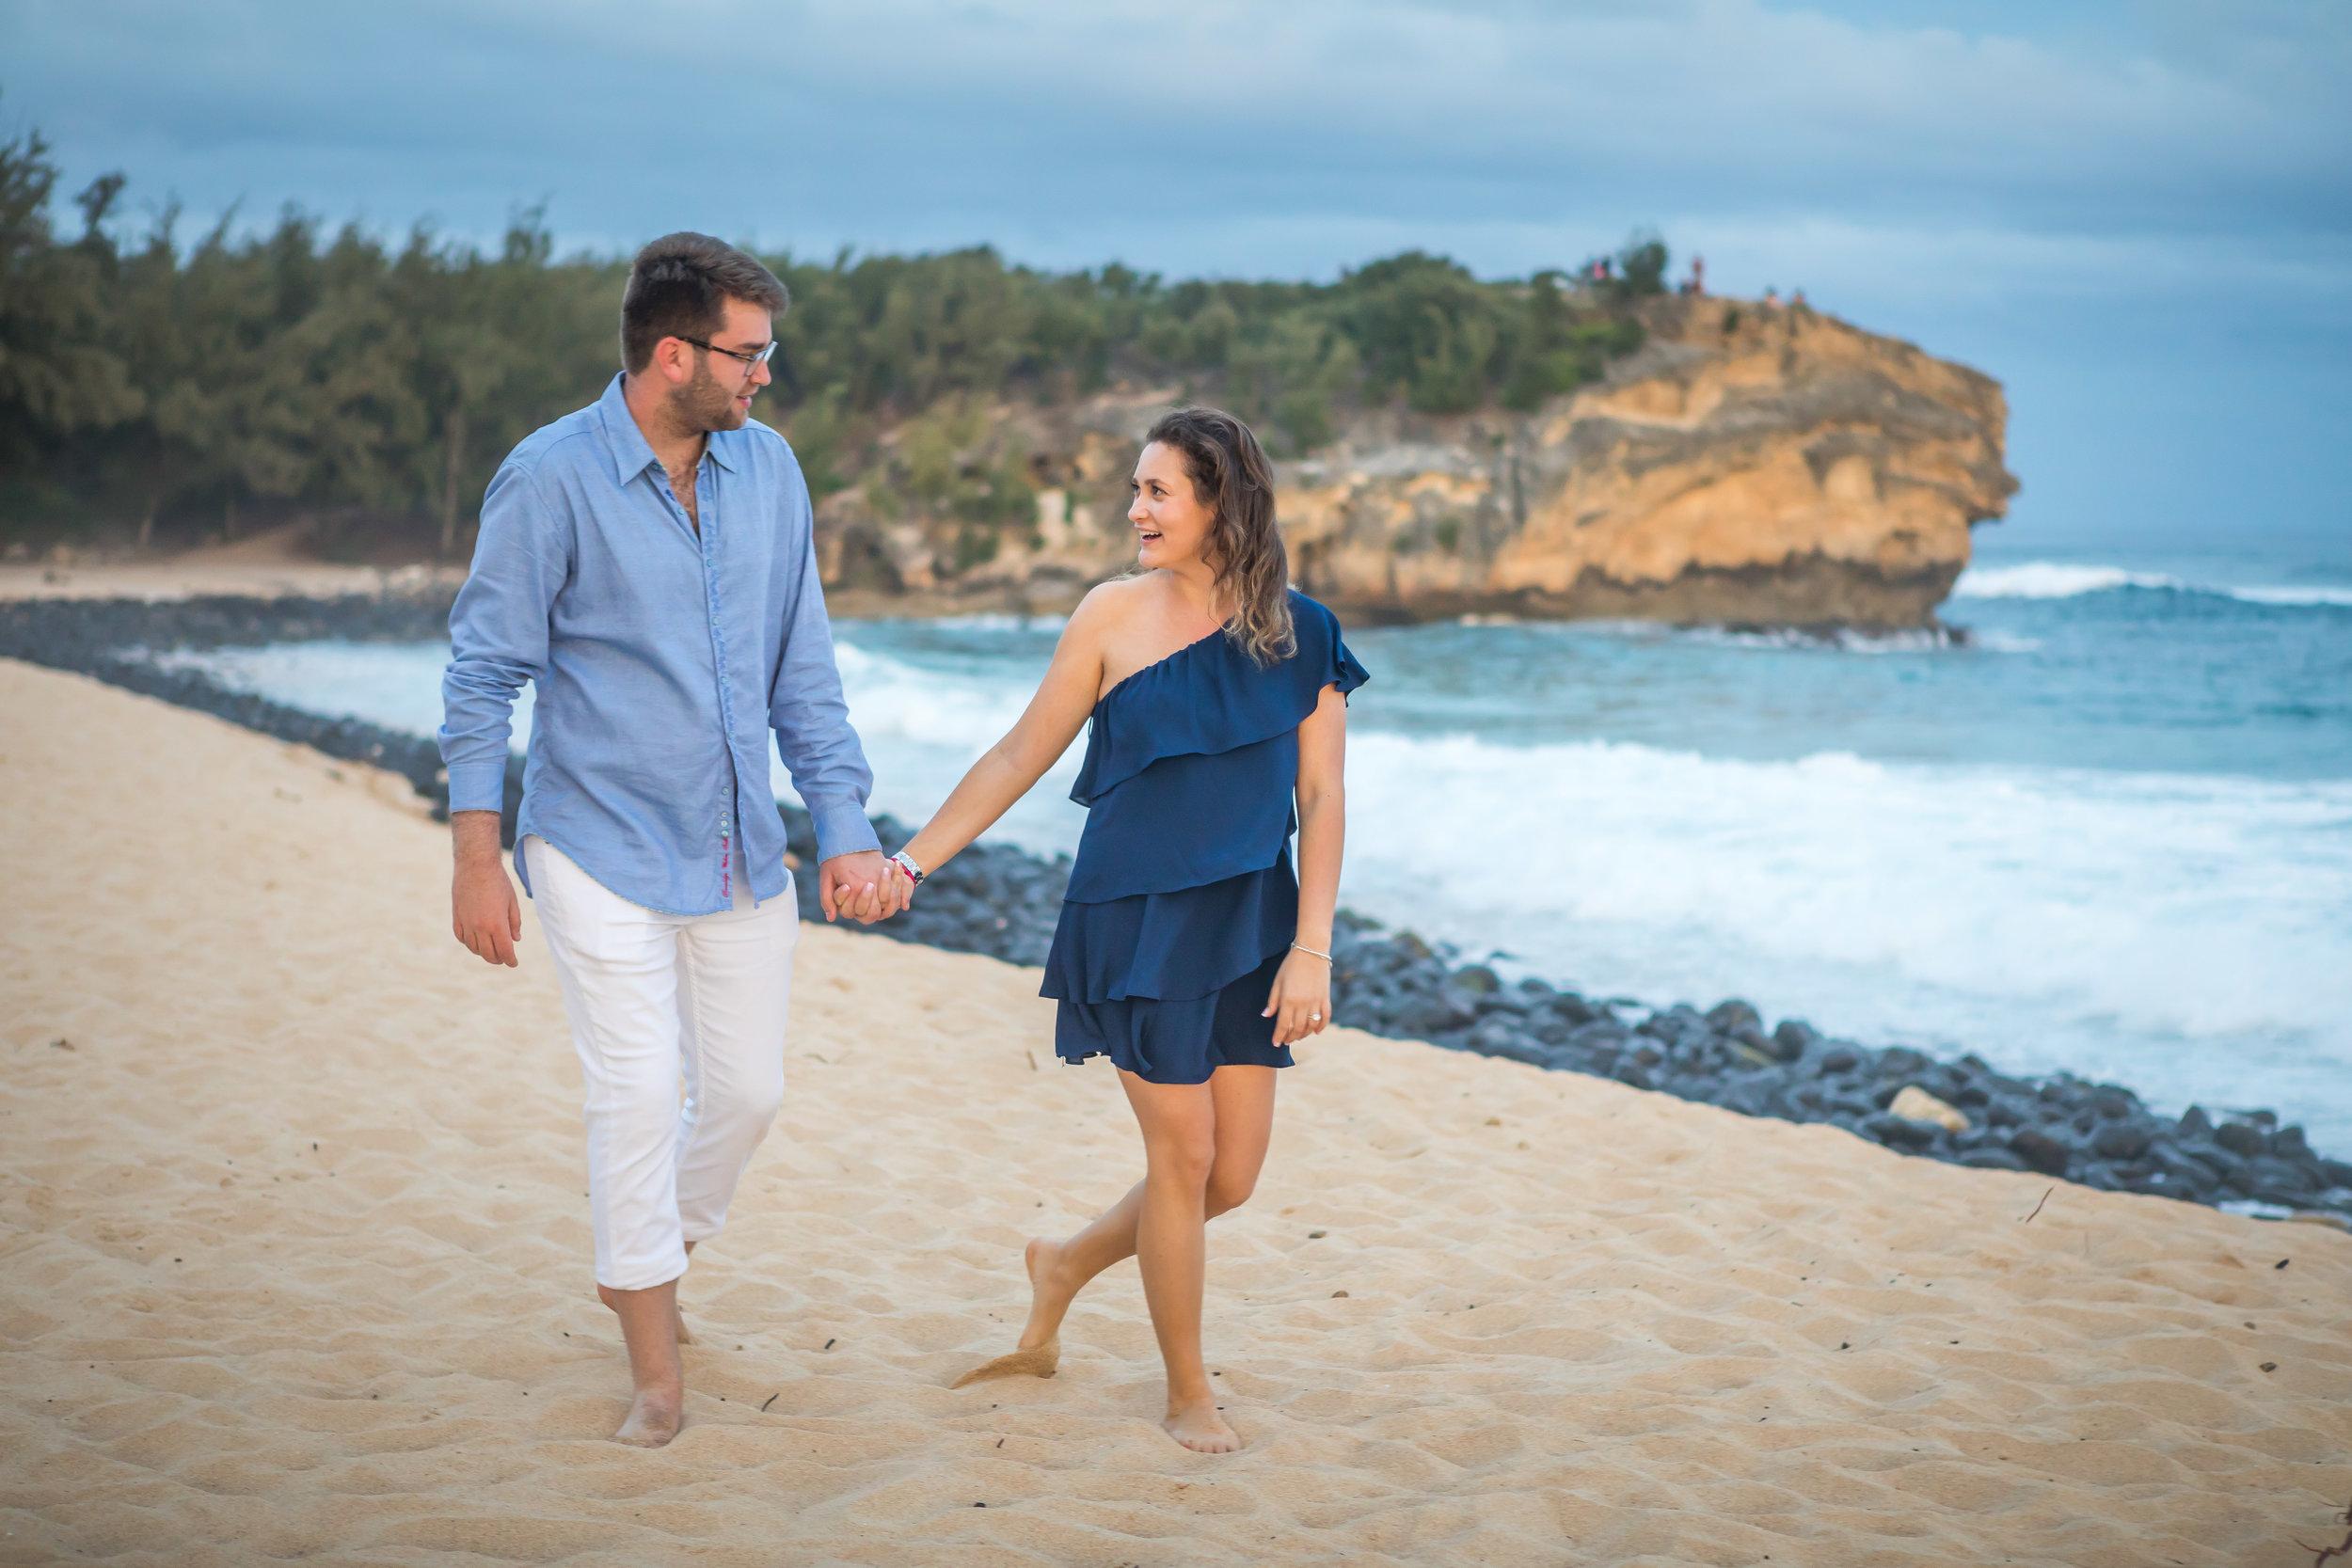 Kauai Surprise Engagement Photo 08